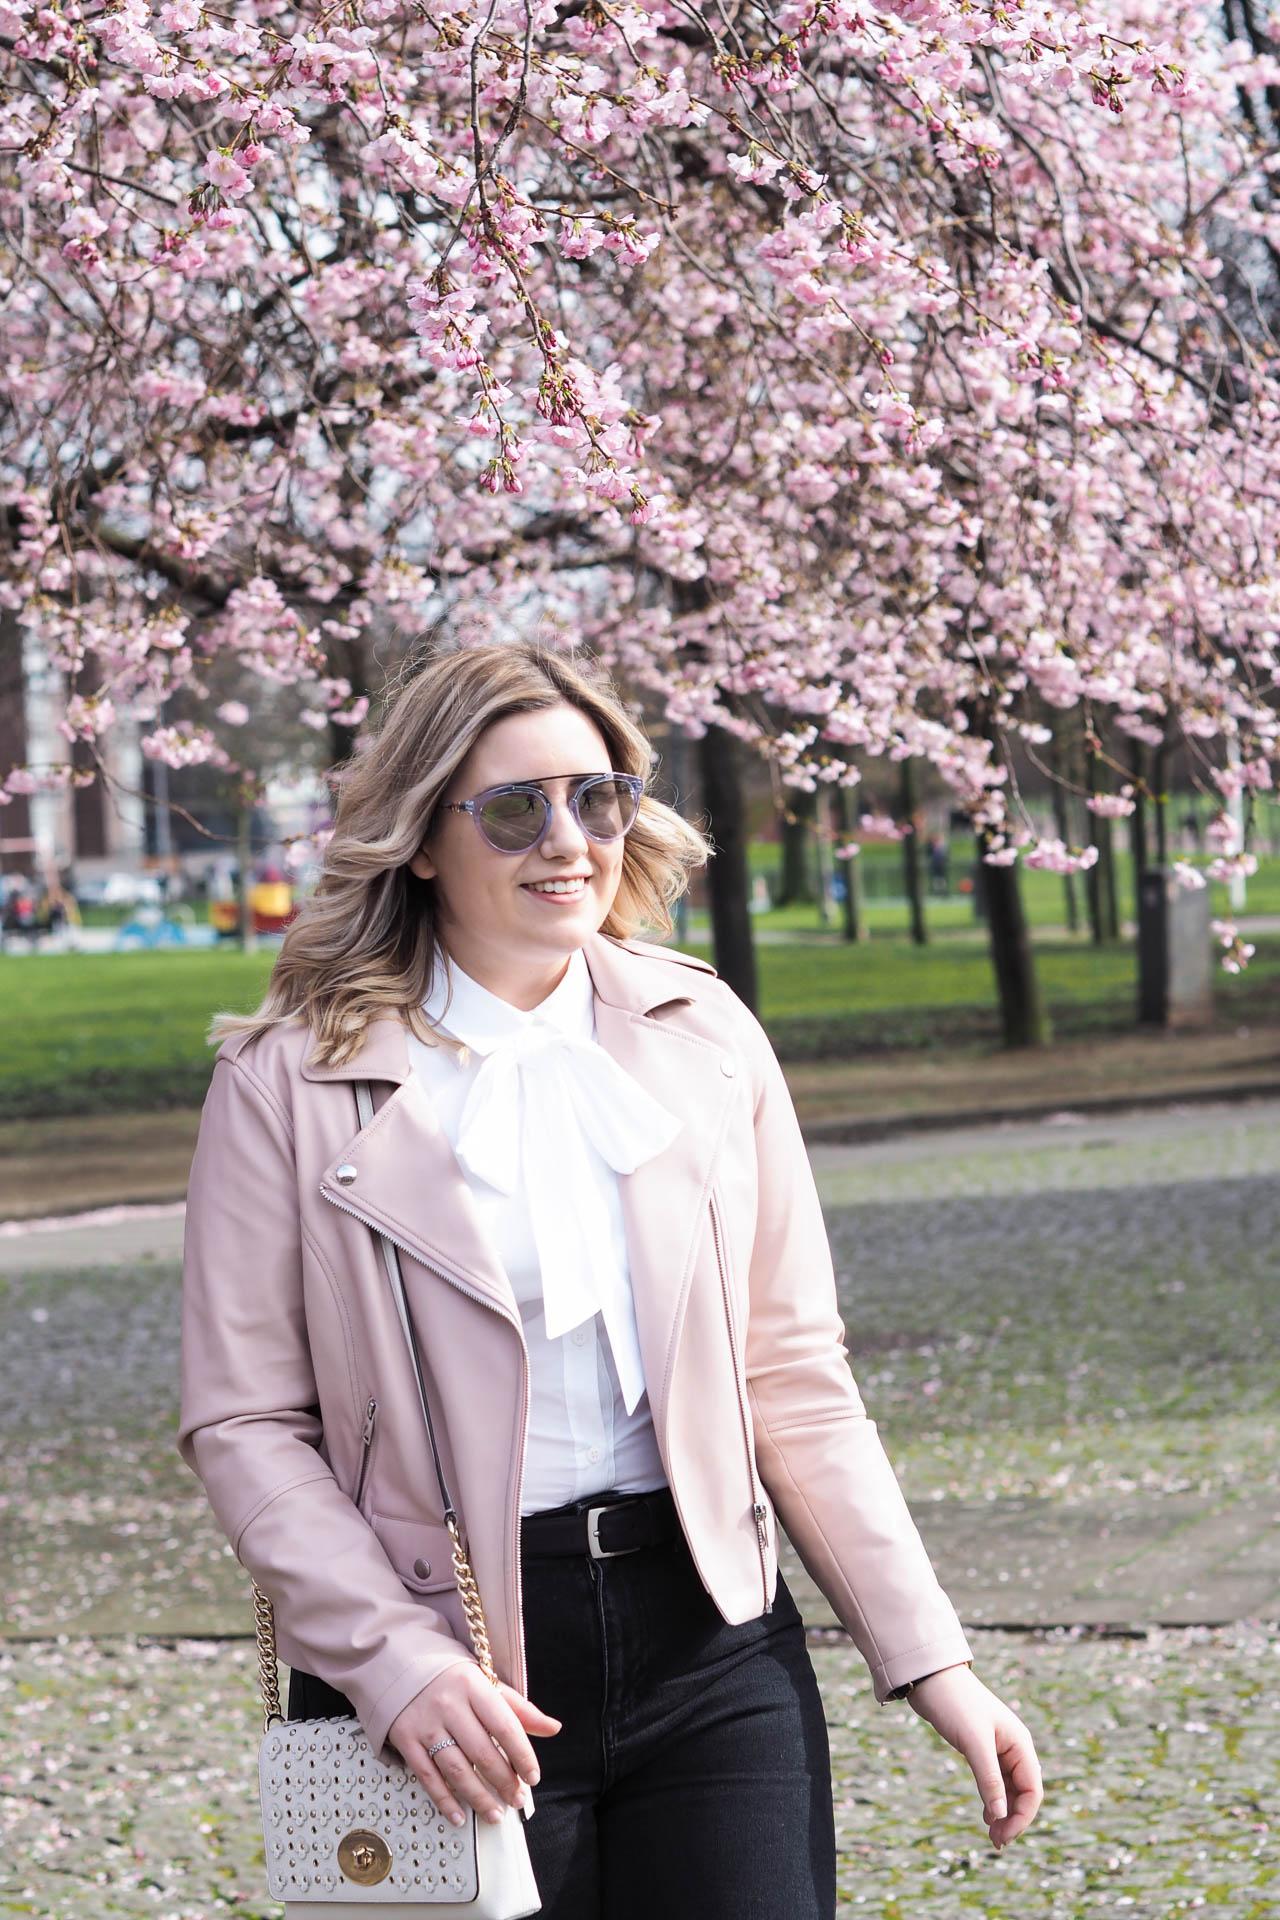 spring fashion white shirt cherry blossom